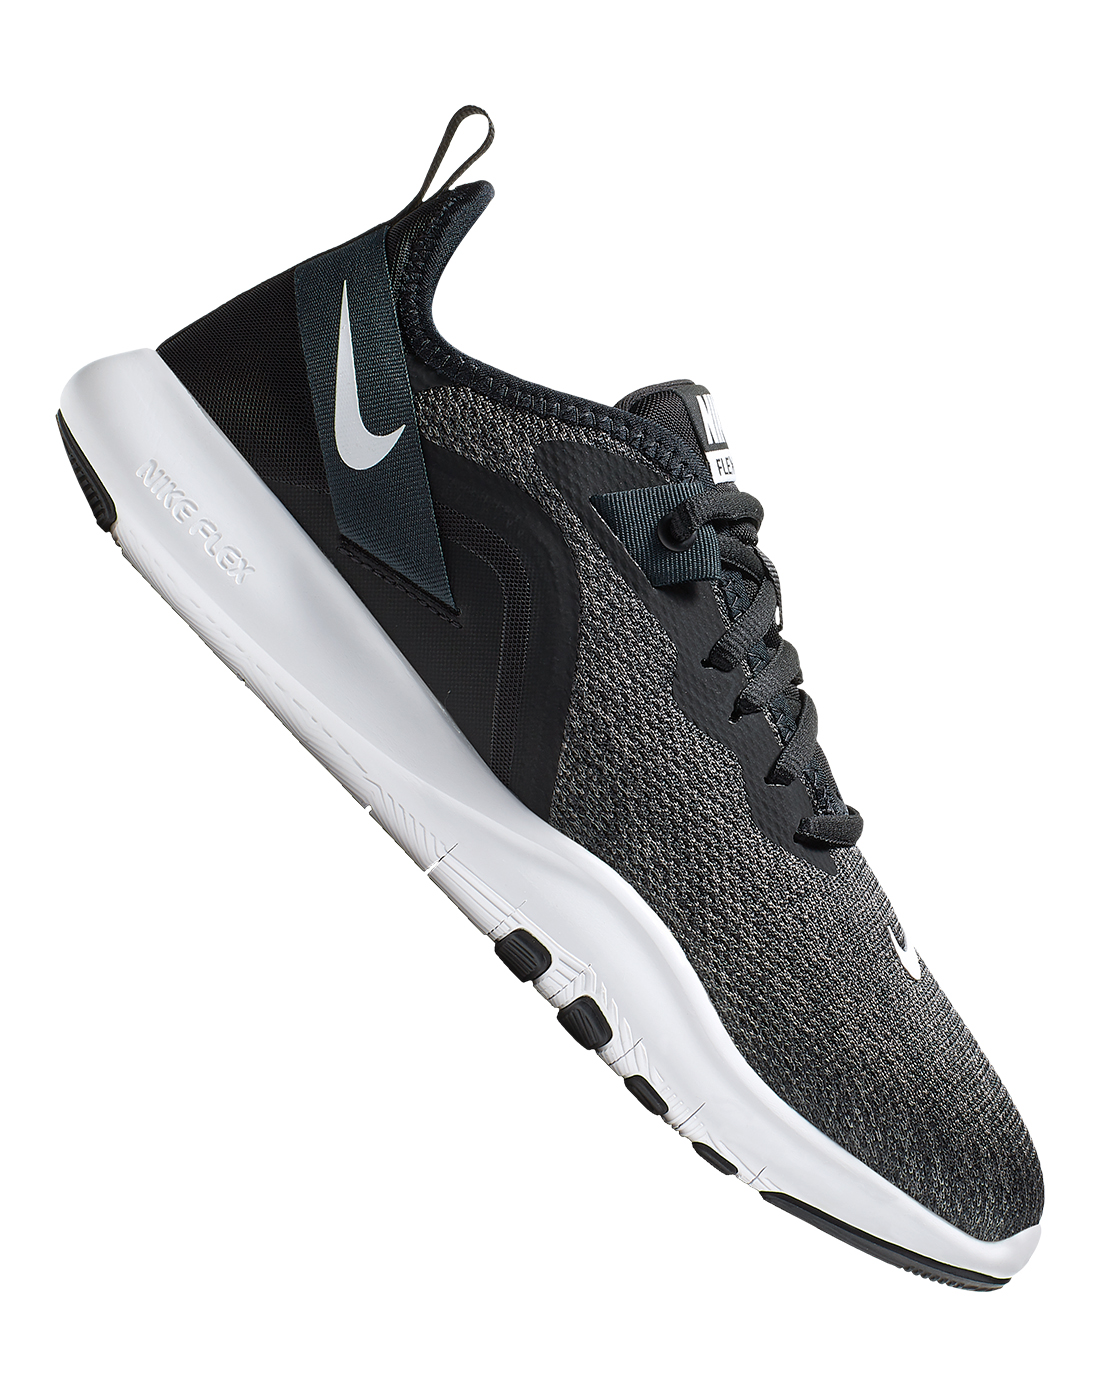 8e31f70e6b82 Women s Black Nike Flex Trainers